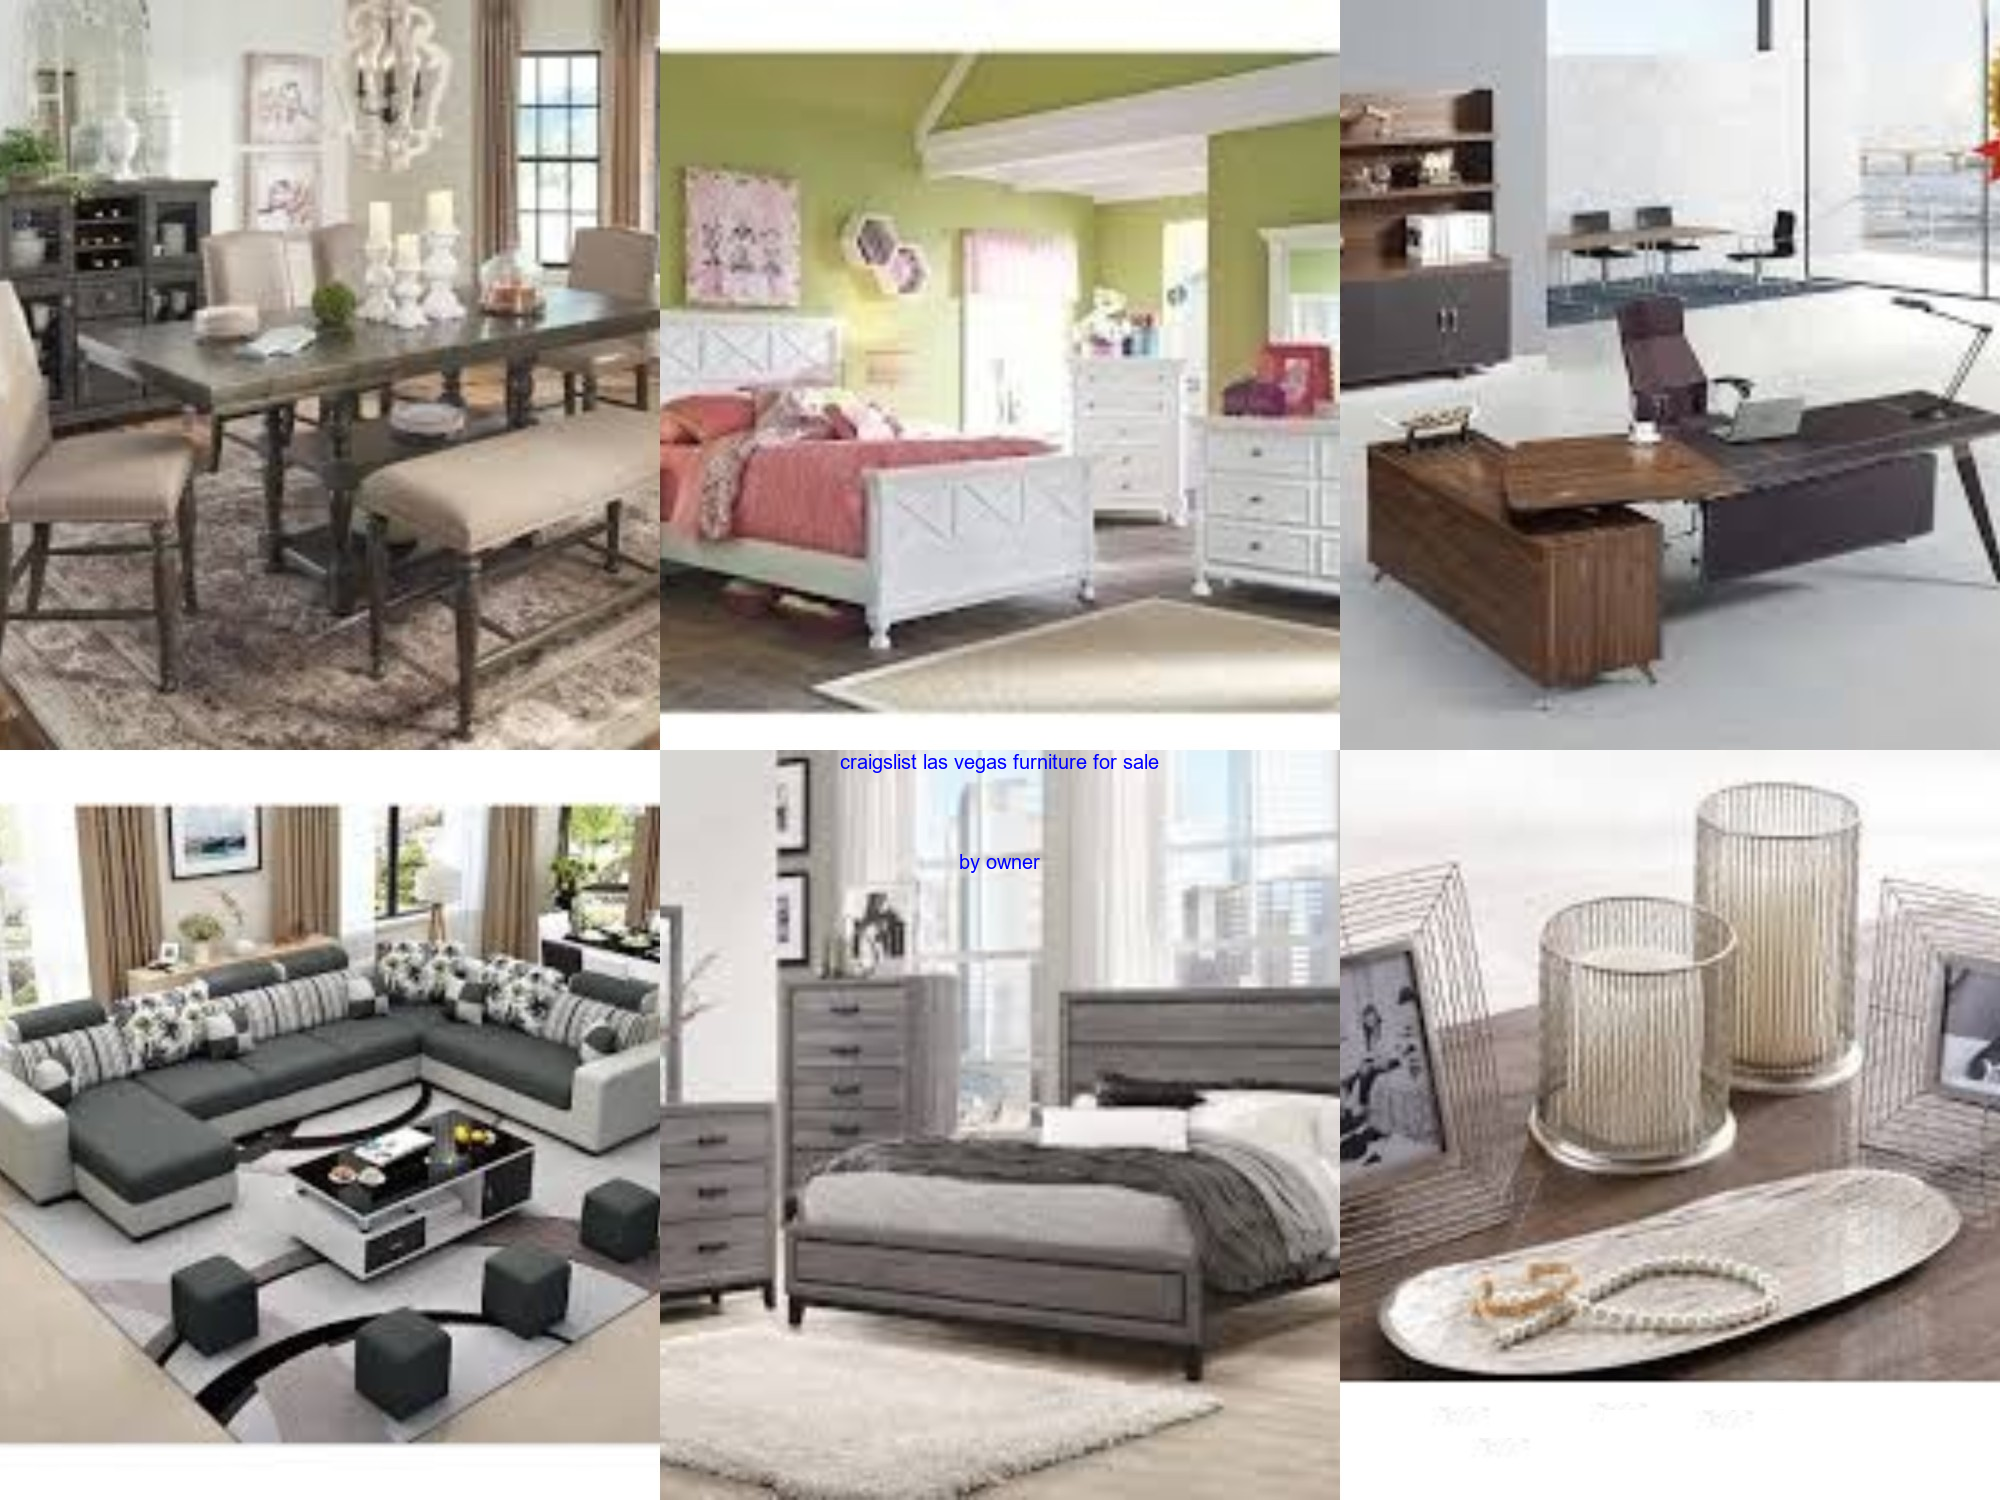 Craigslist Las Vegas Furniture For Sale By Owner Furniture Prices Ashley Furniture Wholesale Furniture